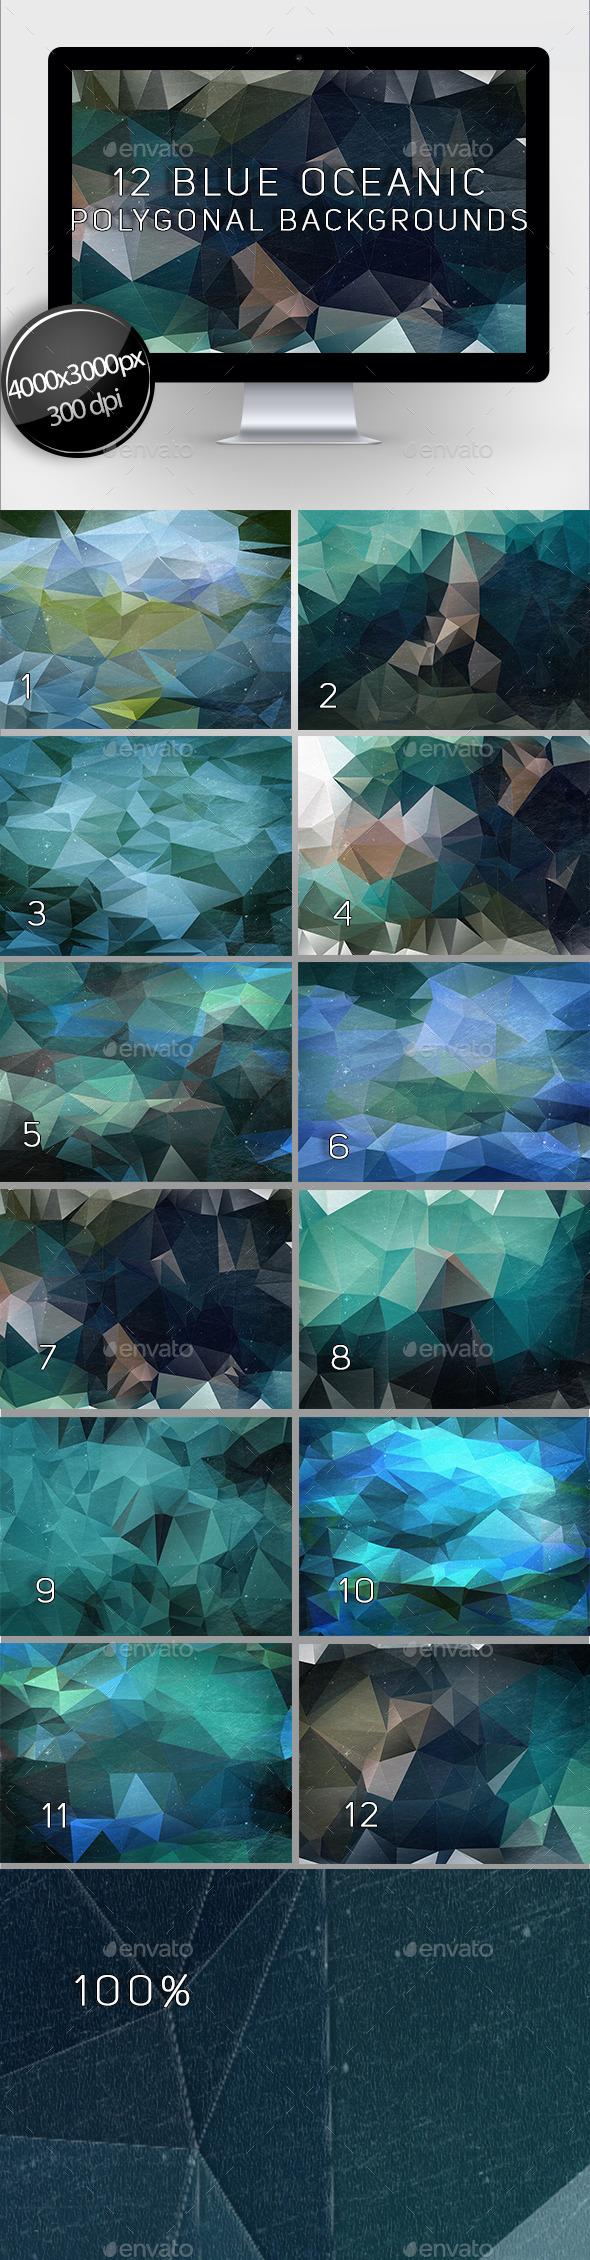 12 Blue Oceanic Polygonal Backgrounds